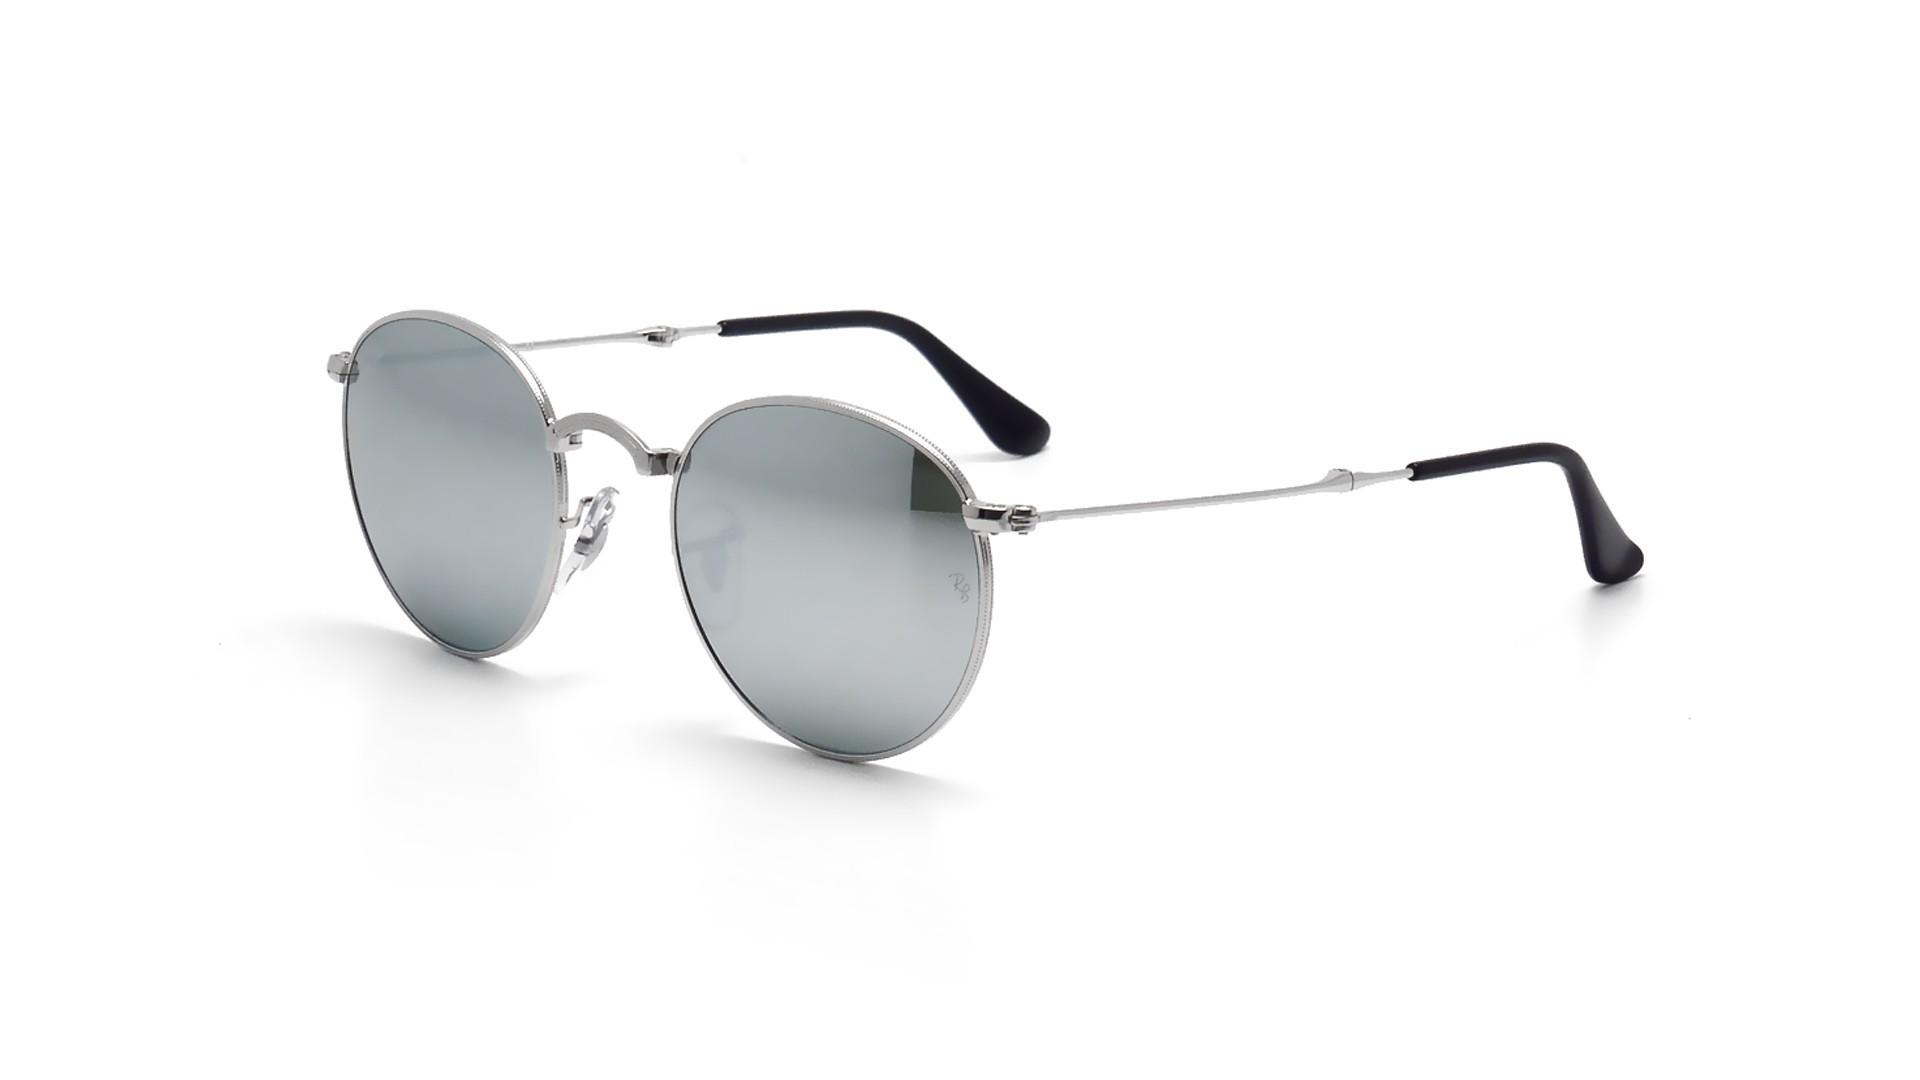 ray ban round metal sunglasses look alike